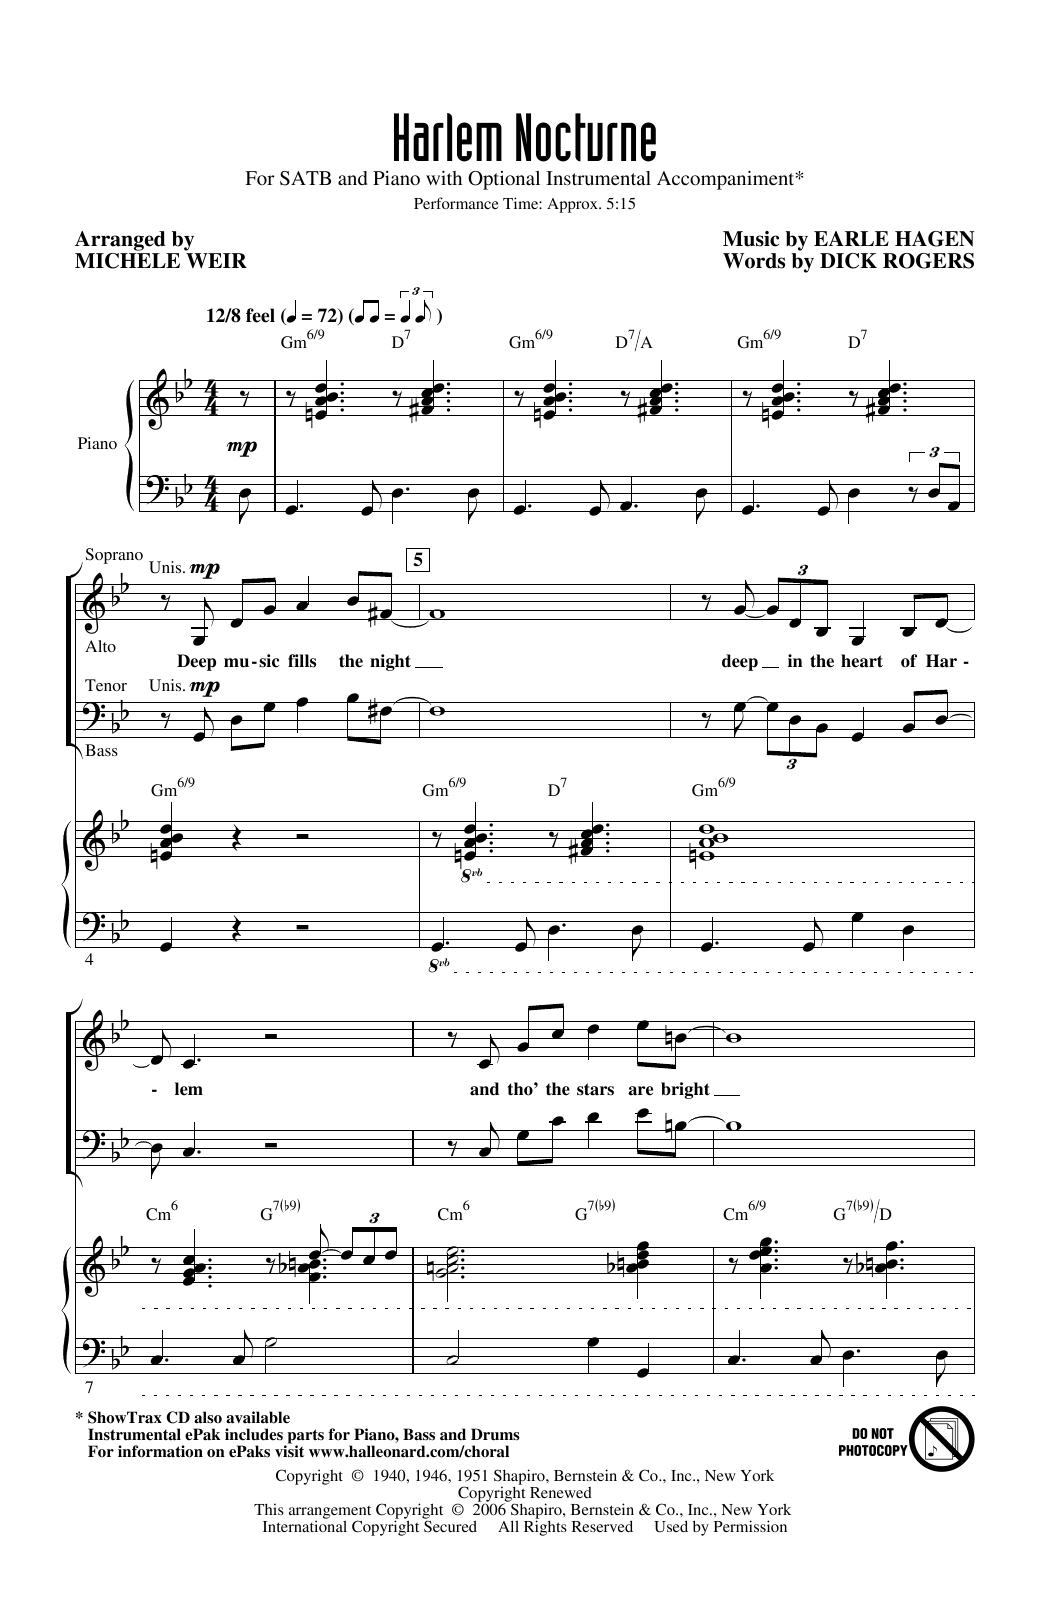 Harlem Nocturne (arr. Michele Weir) Sheet Music